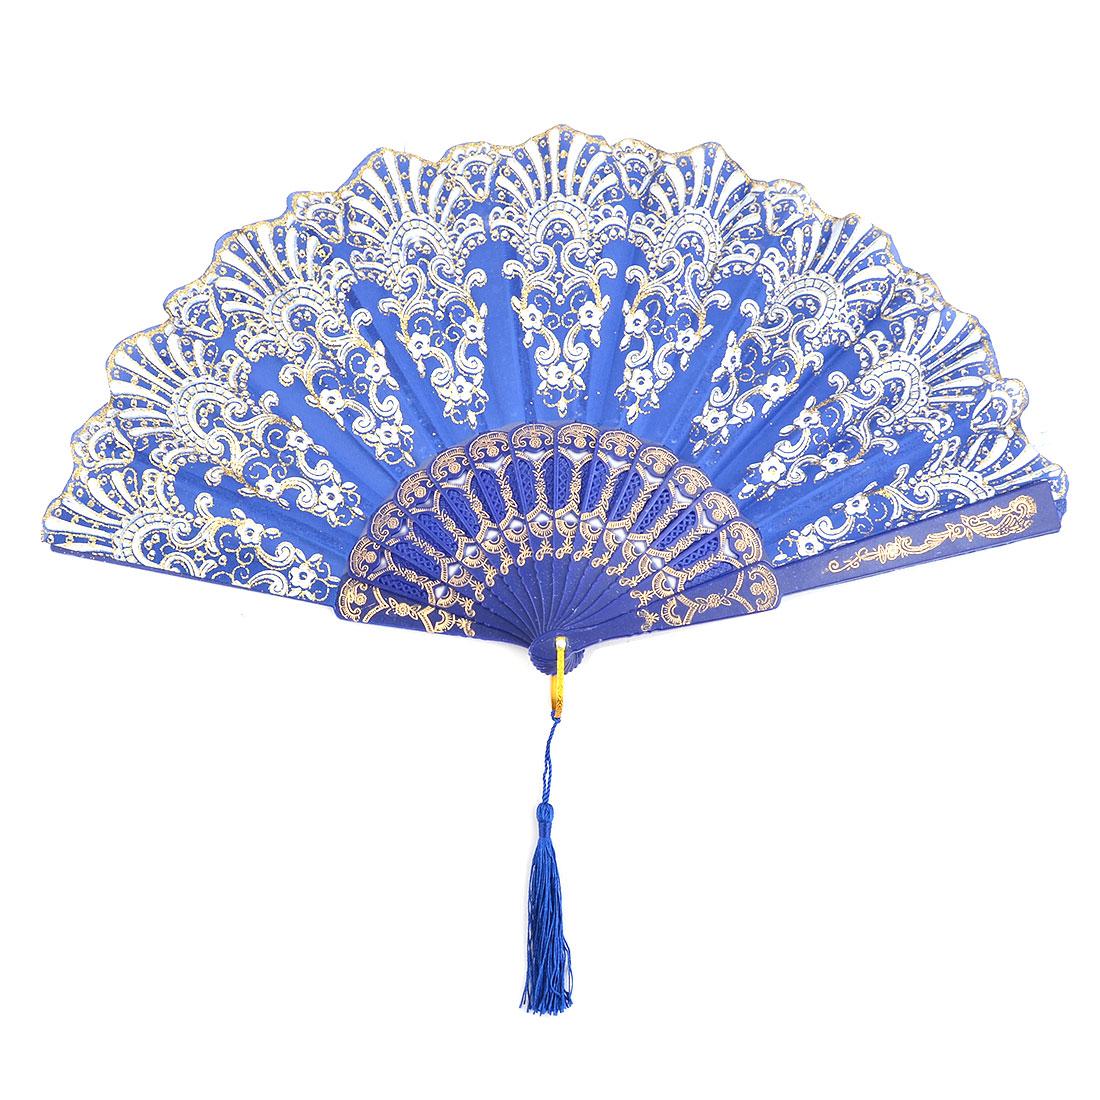 Lady Plastic Frame Flower Print Folding Dancing Cooling Hand Fan Blue 24cm Length